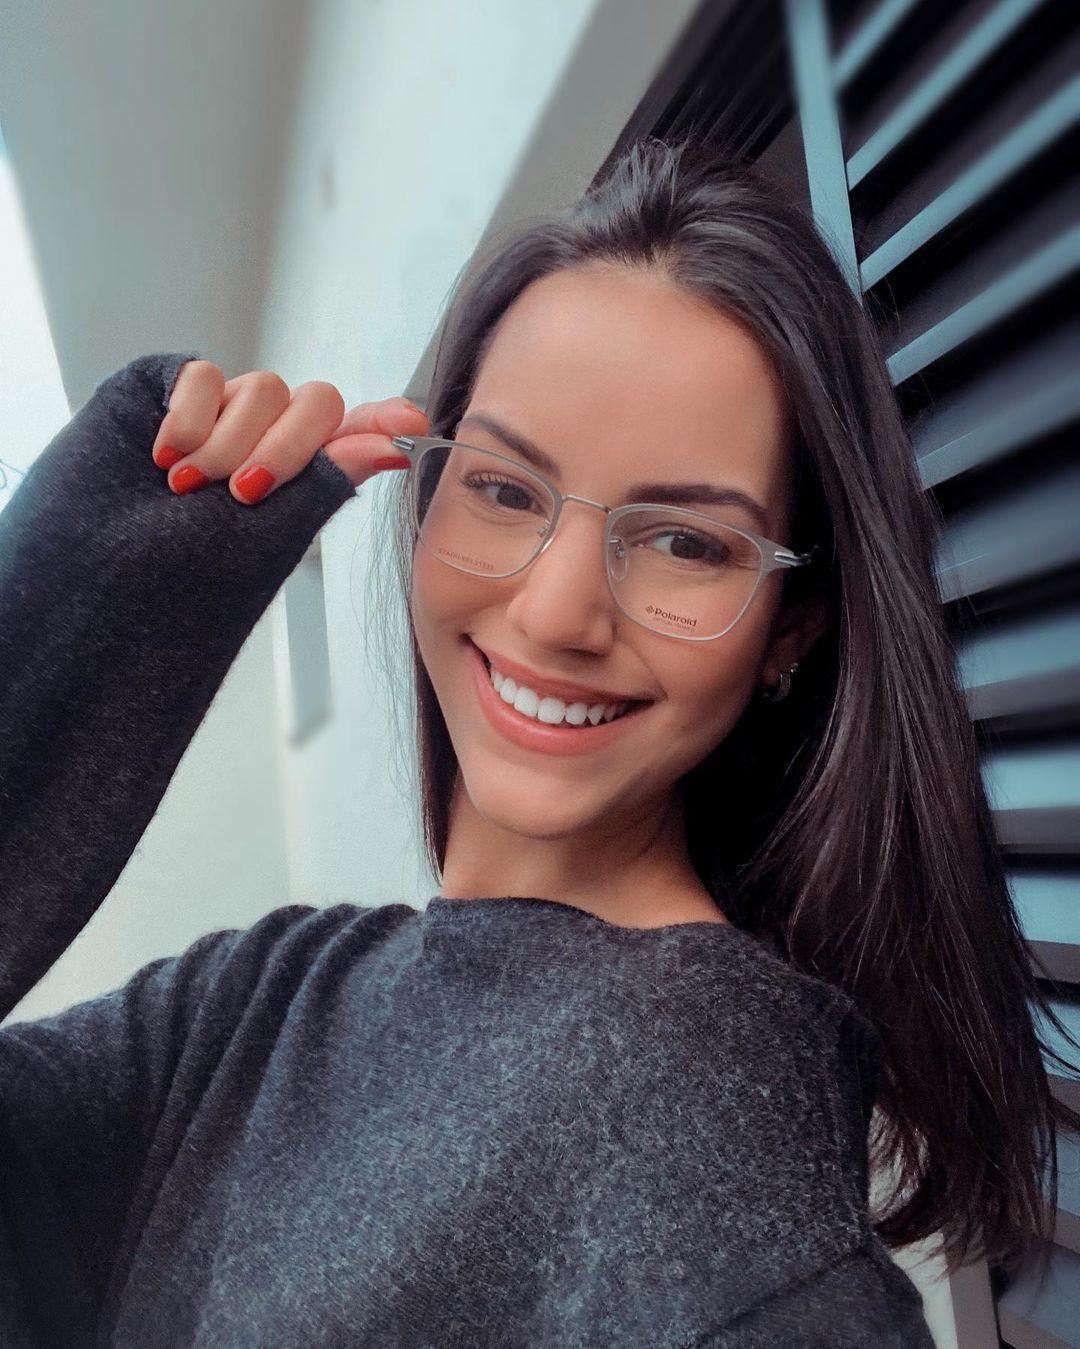 rafaella felipe, top 20 de miss brasil mundo 2019. - Página 3 Qtd1nn10